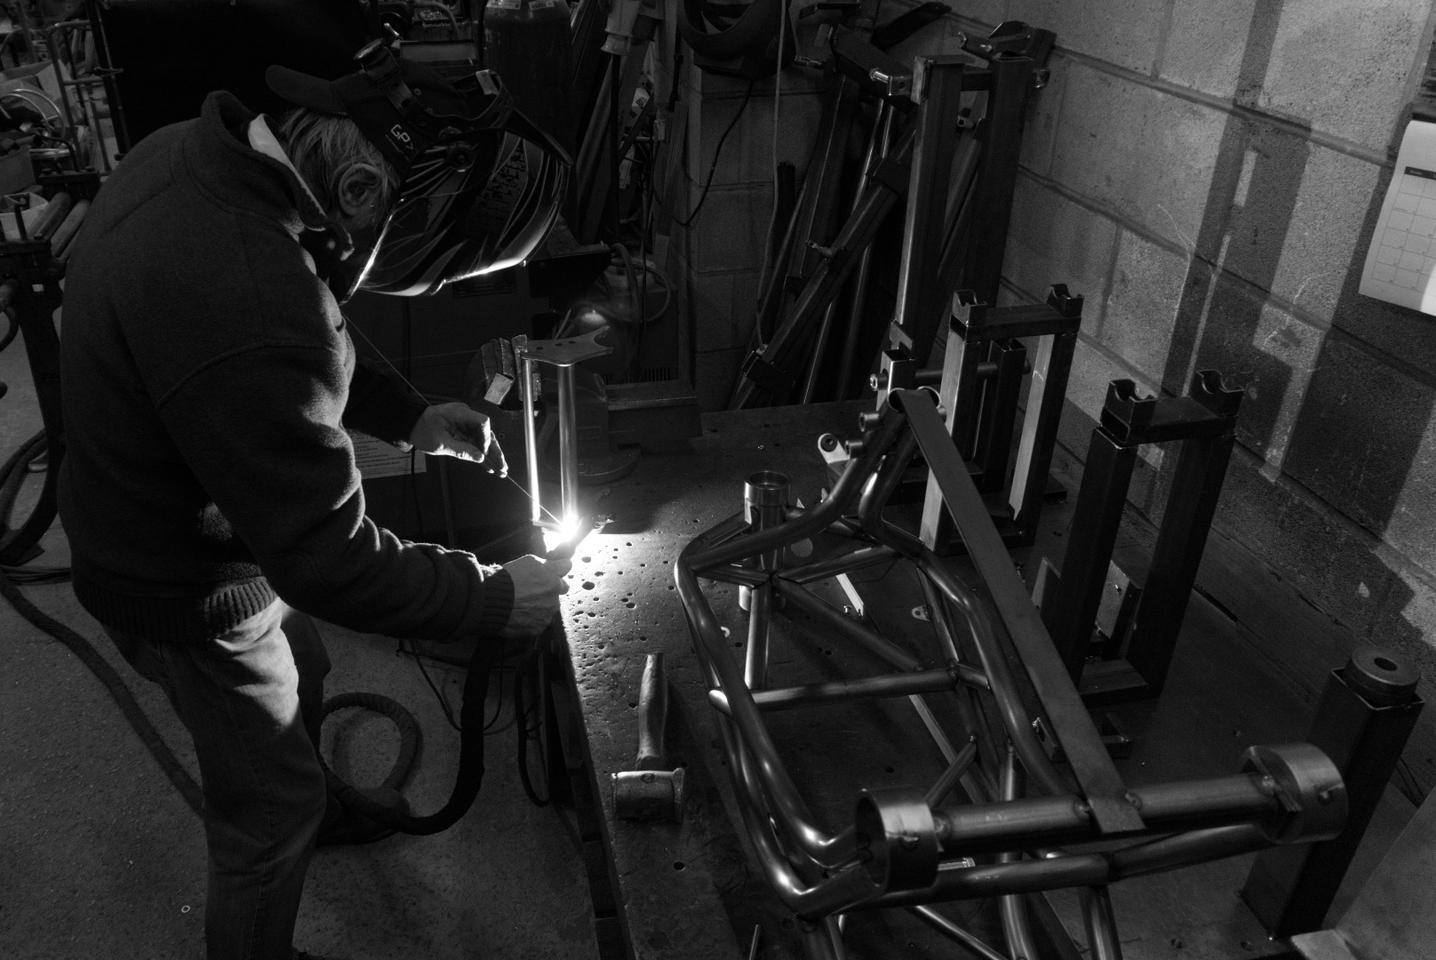 Welding the trellis frame of the CCM Spitfire